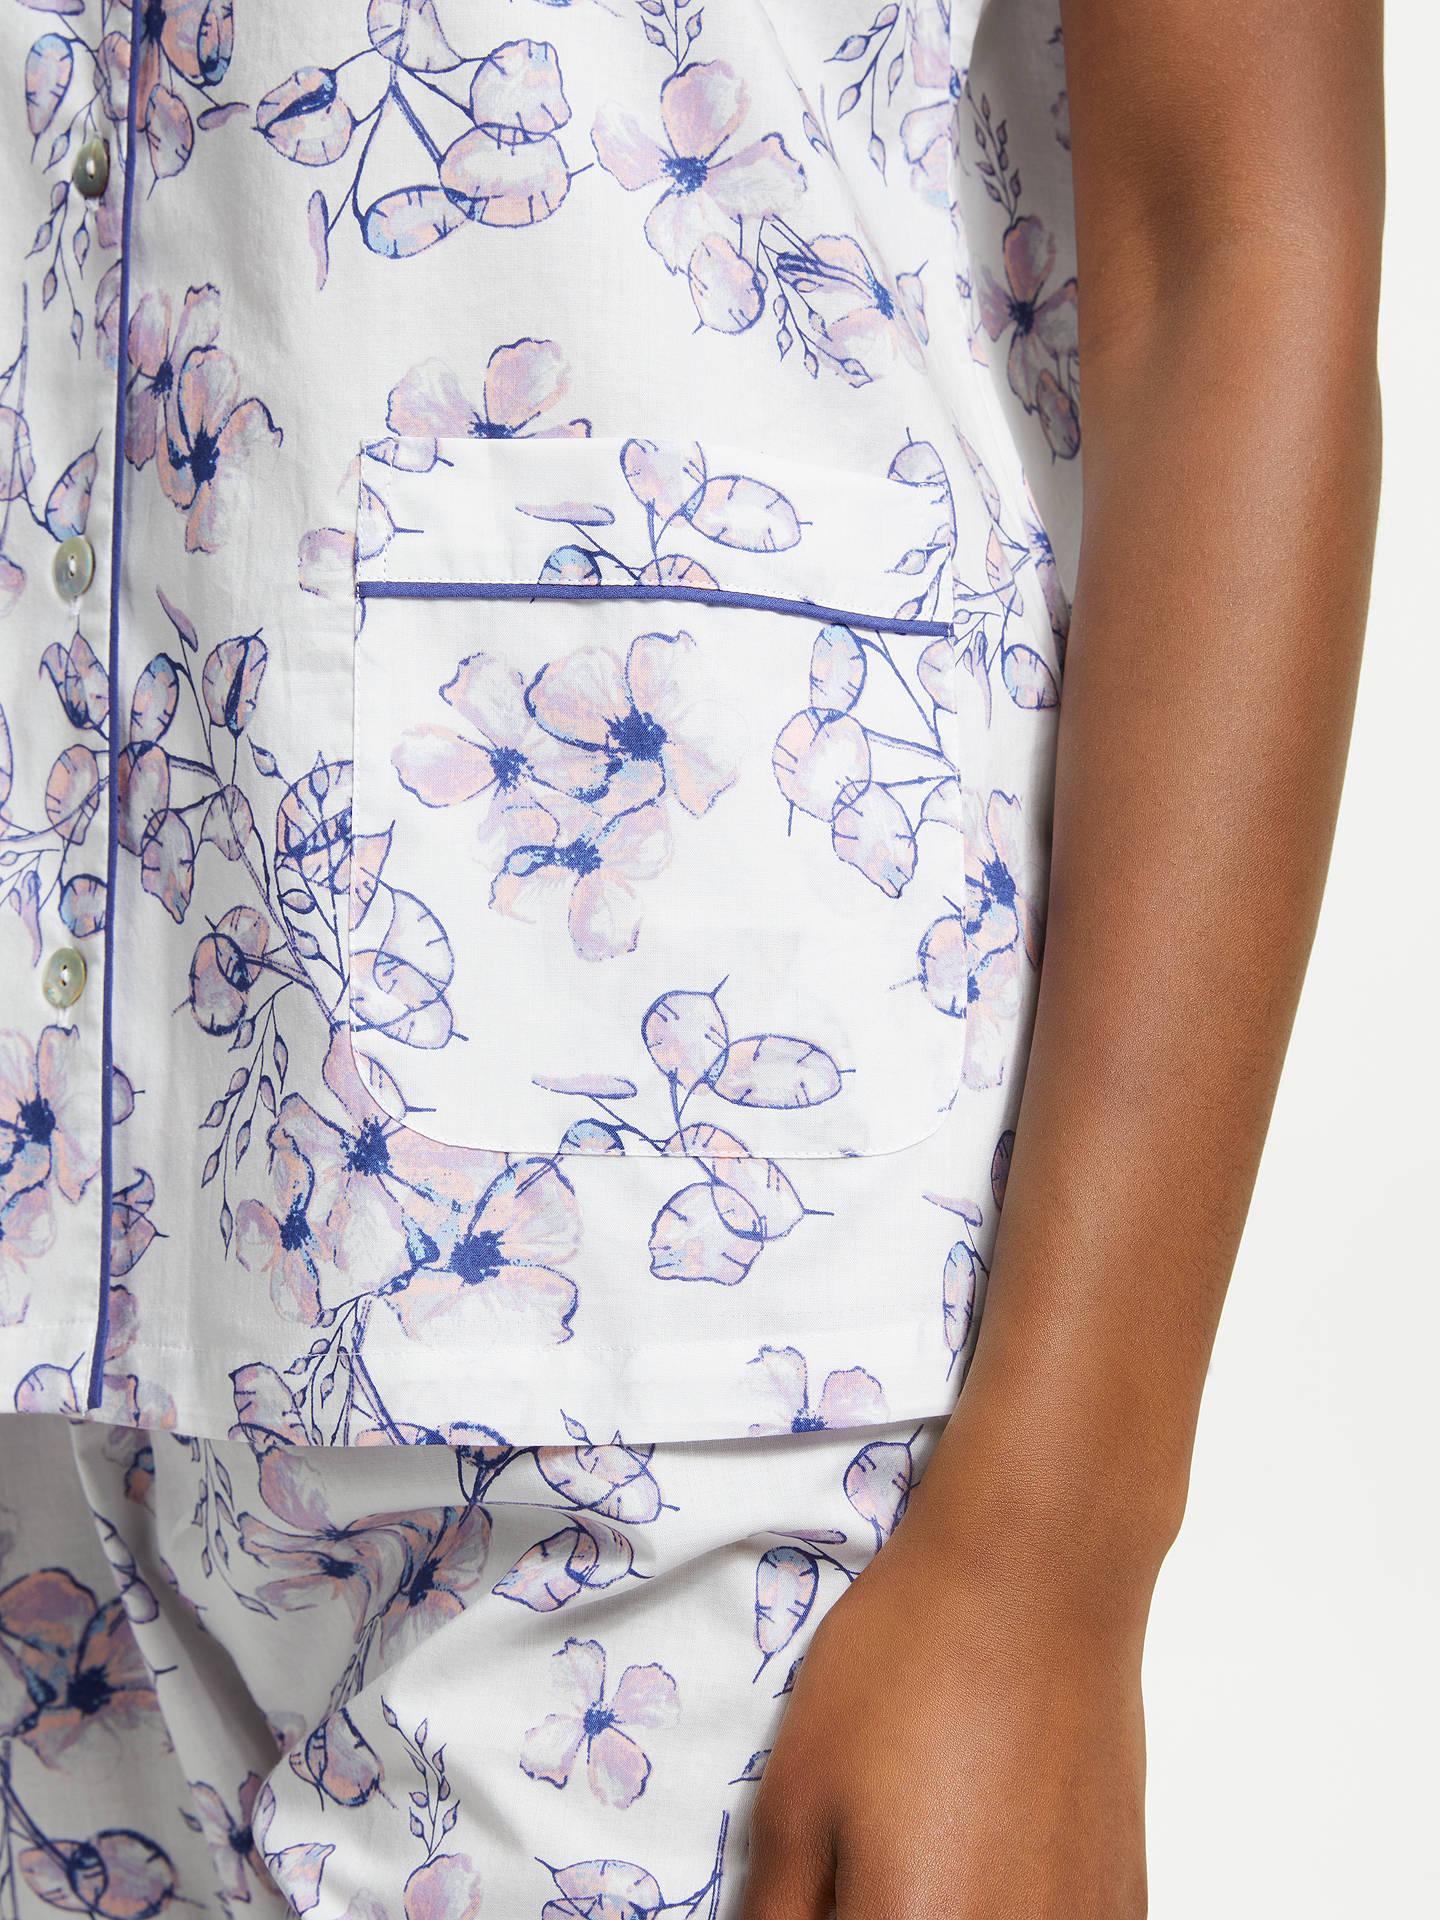 a43f4d0b8d3 ... Buy John Lewis   Partners Honesty Floral Print Cotton Pyjama Set